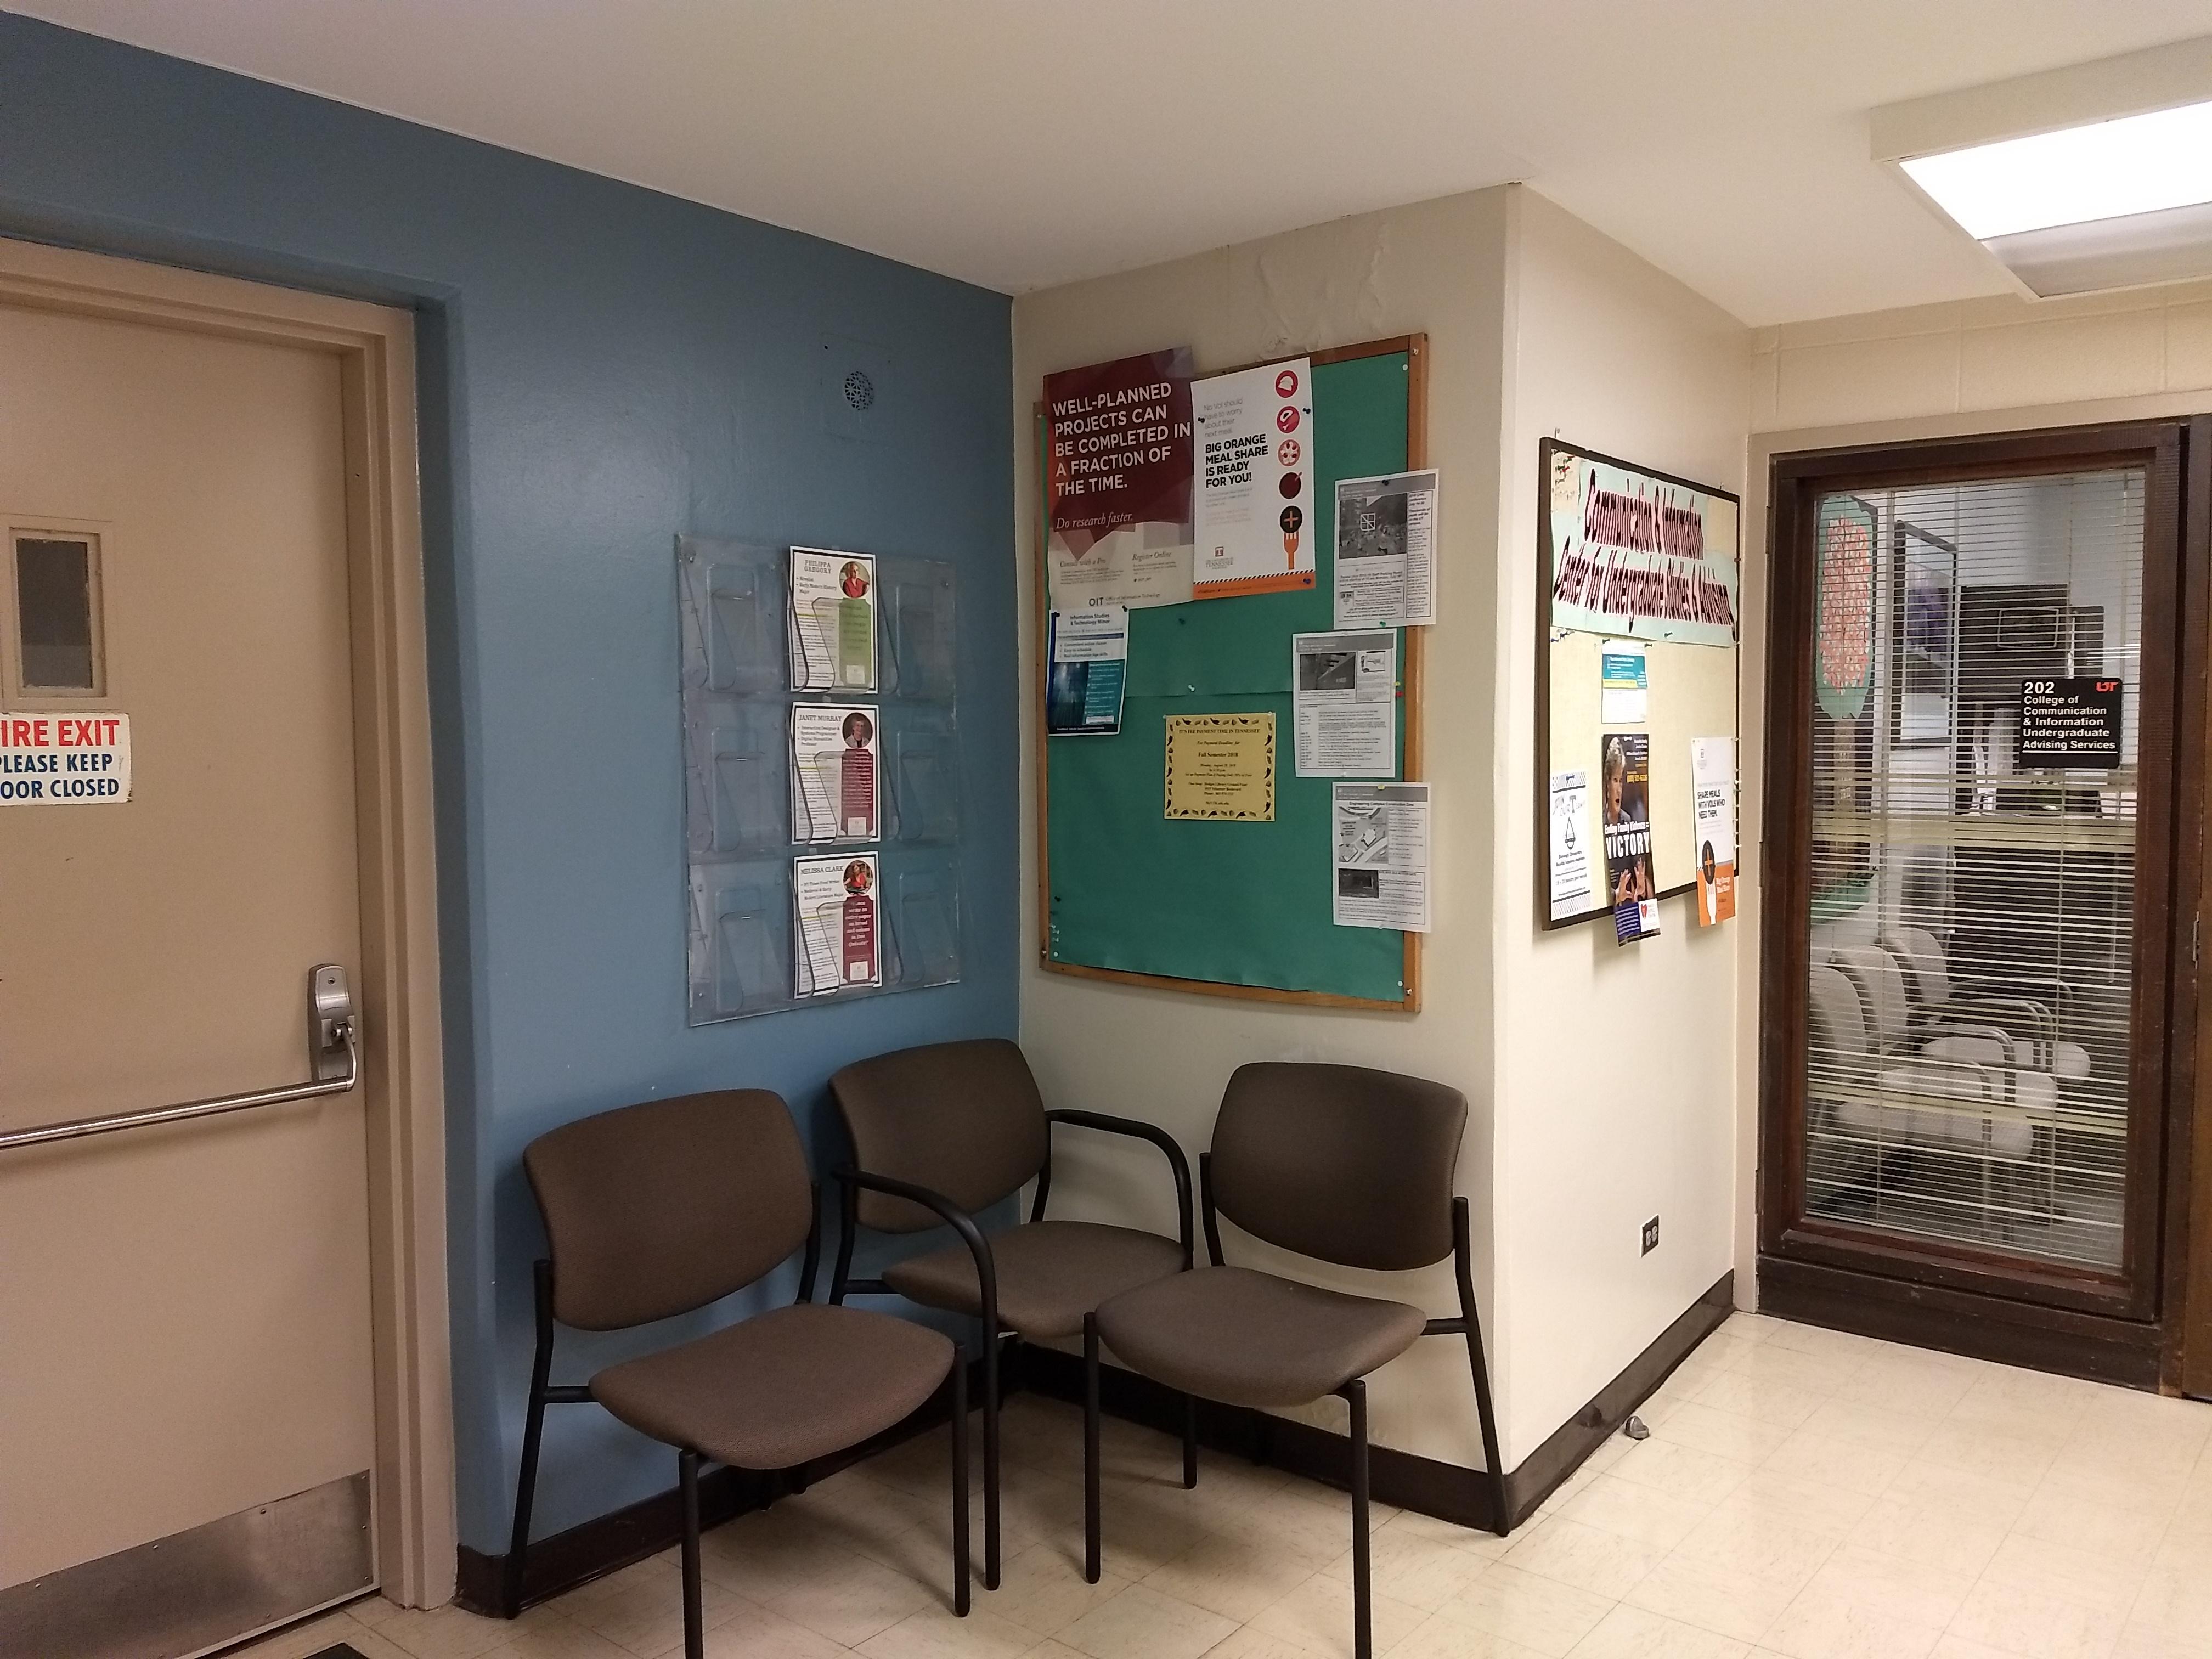 2nd floor between stairs and cci undergrad advising room 202